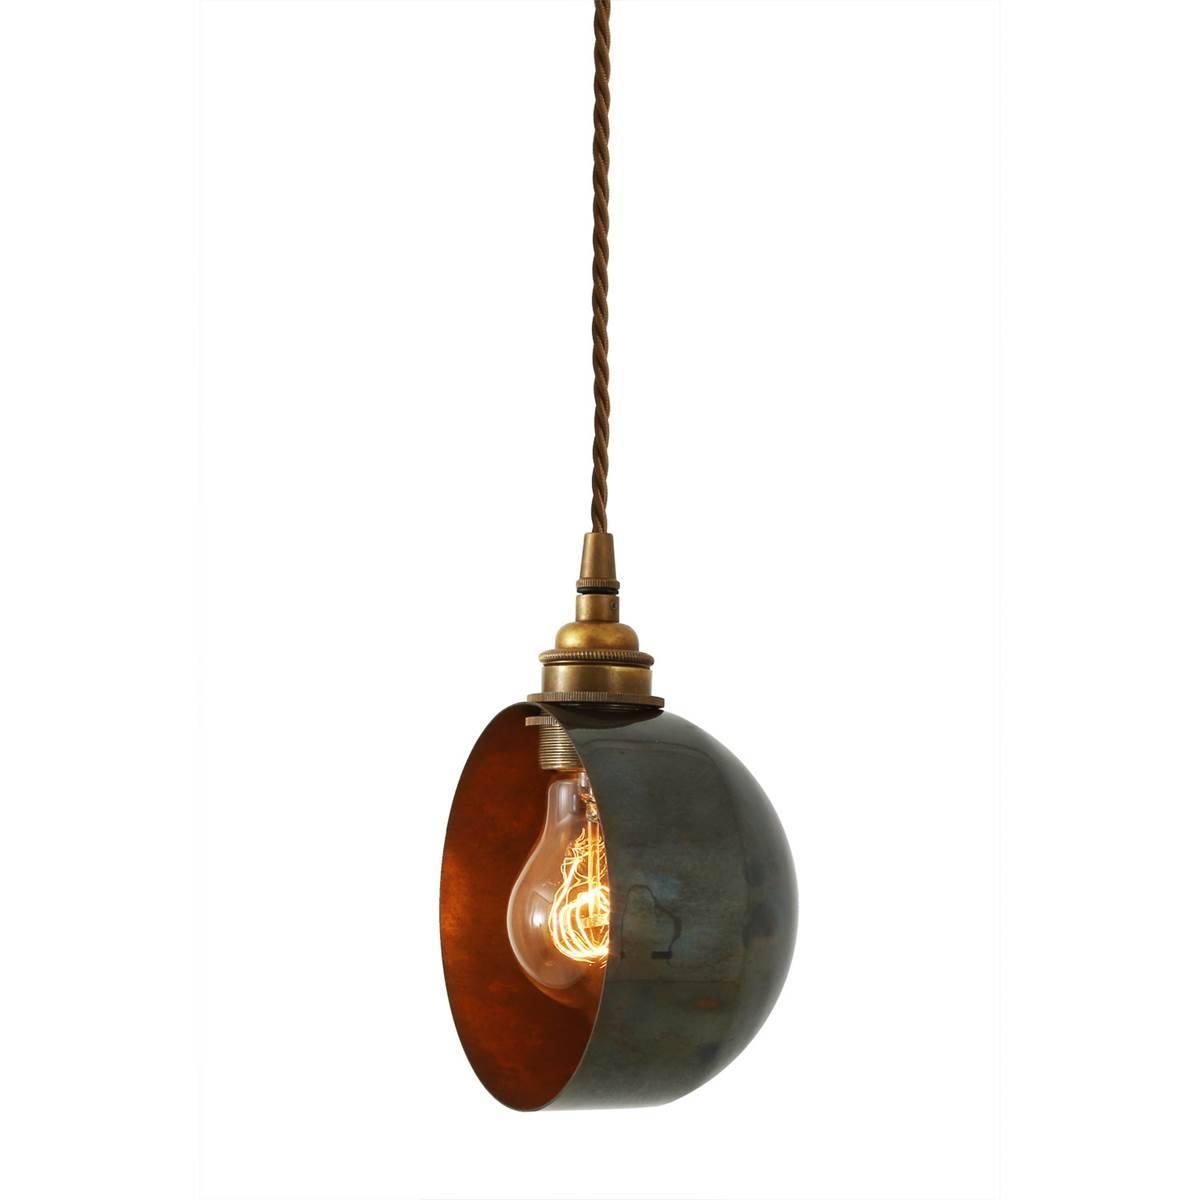 Bogota Modern Pendant Light | Mullan Lighting regarding Quirky Pendant Lights (Image 9 of 15)